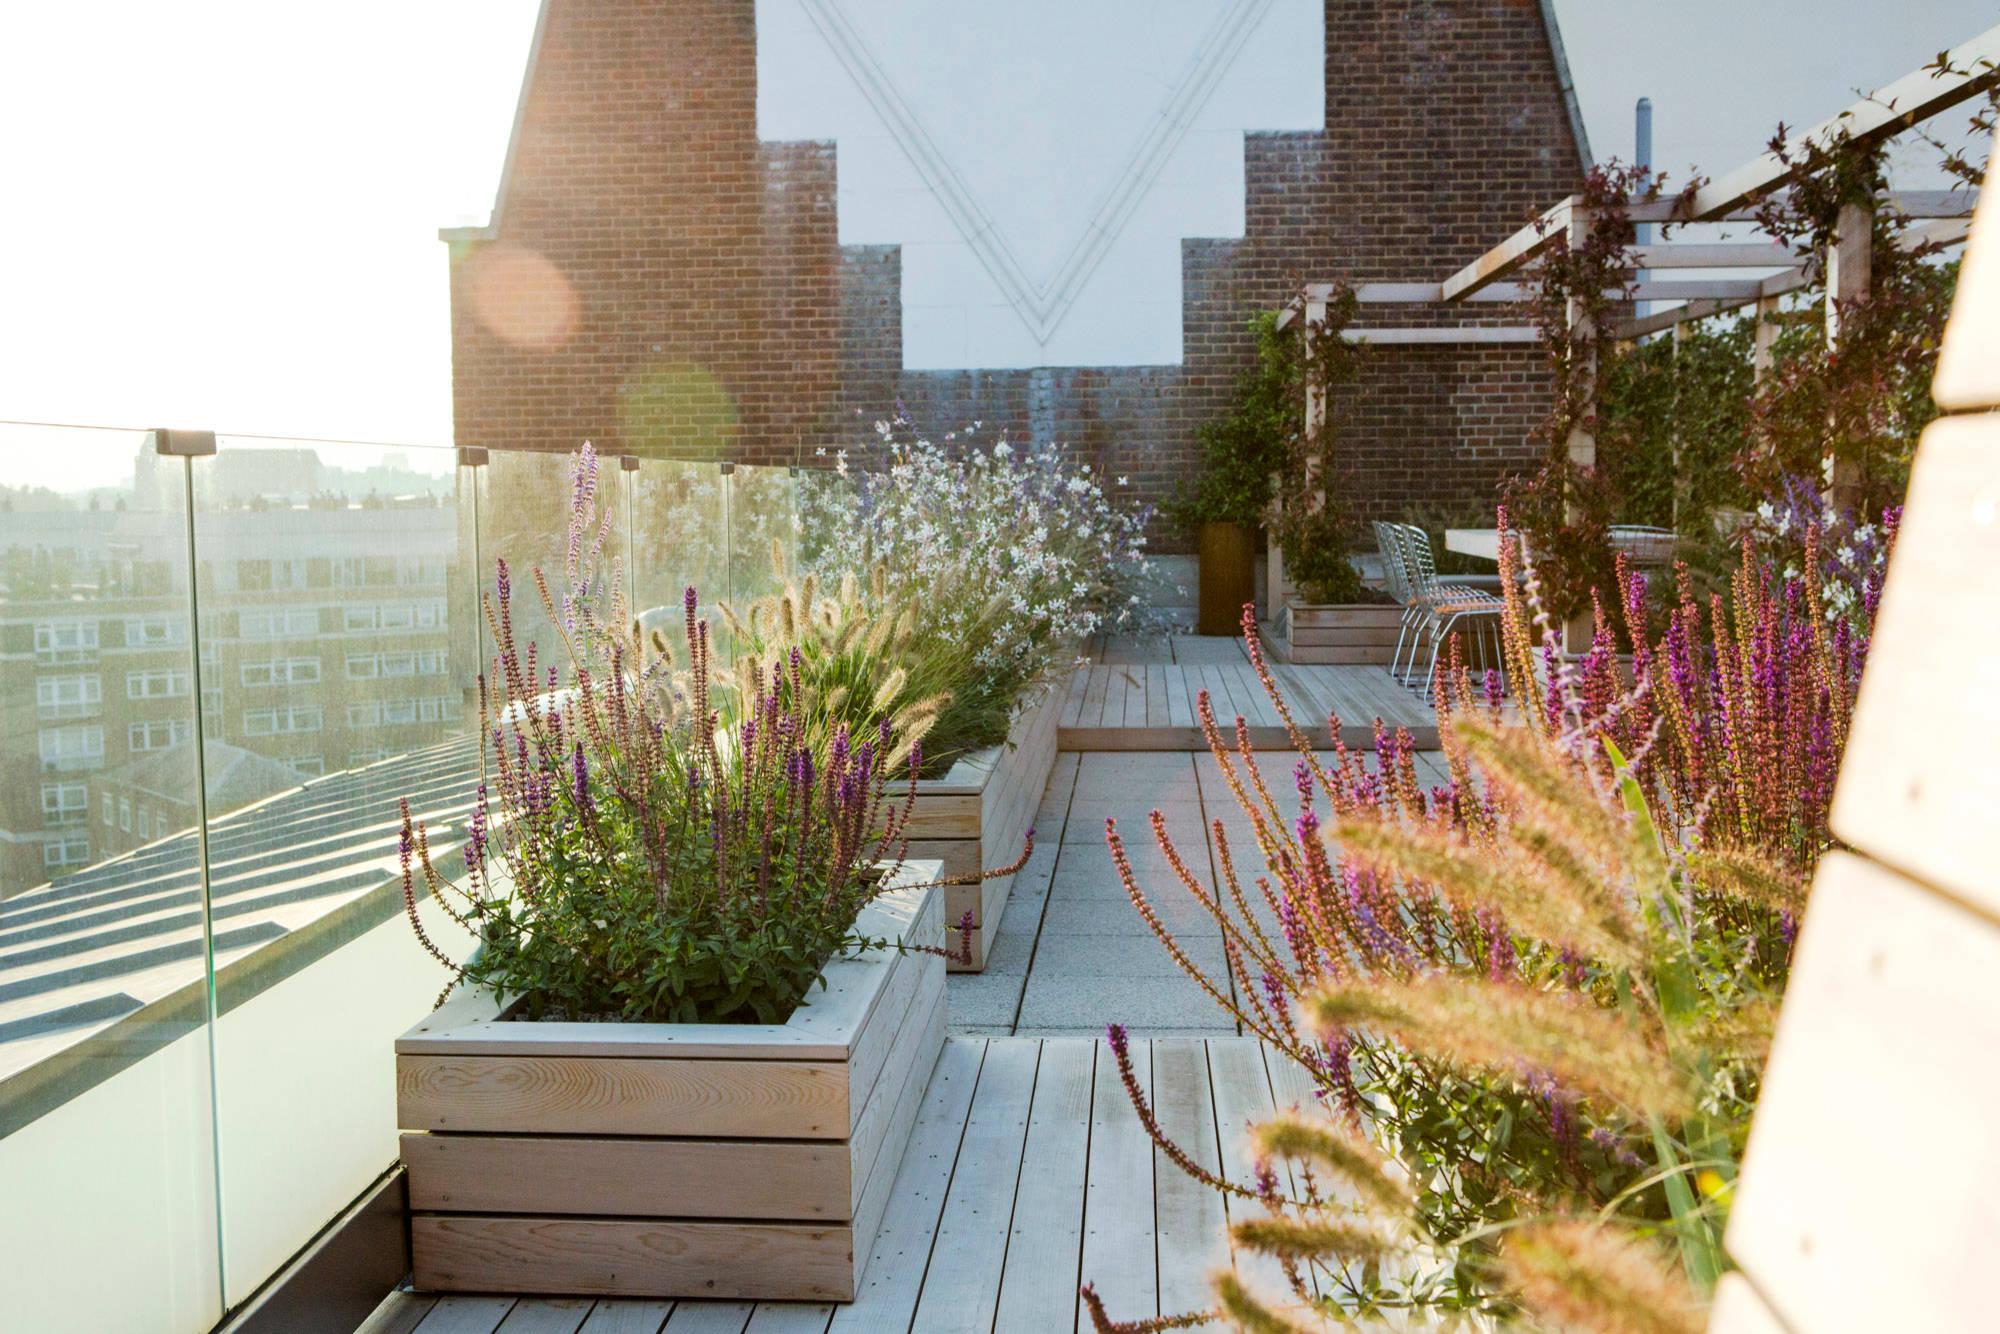 16 Delightful Modern Landscape Ideas That Will Update Your ... on Small Landscape Garden Ideas id=17577